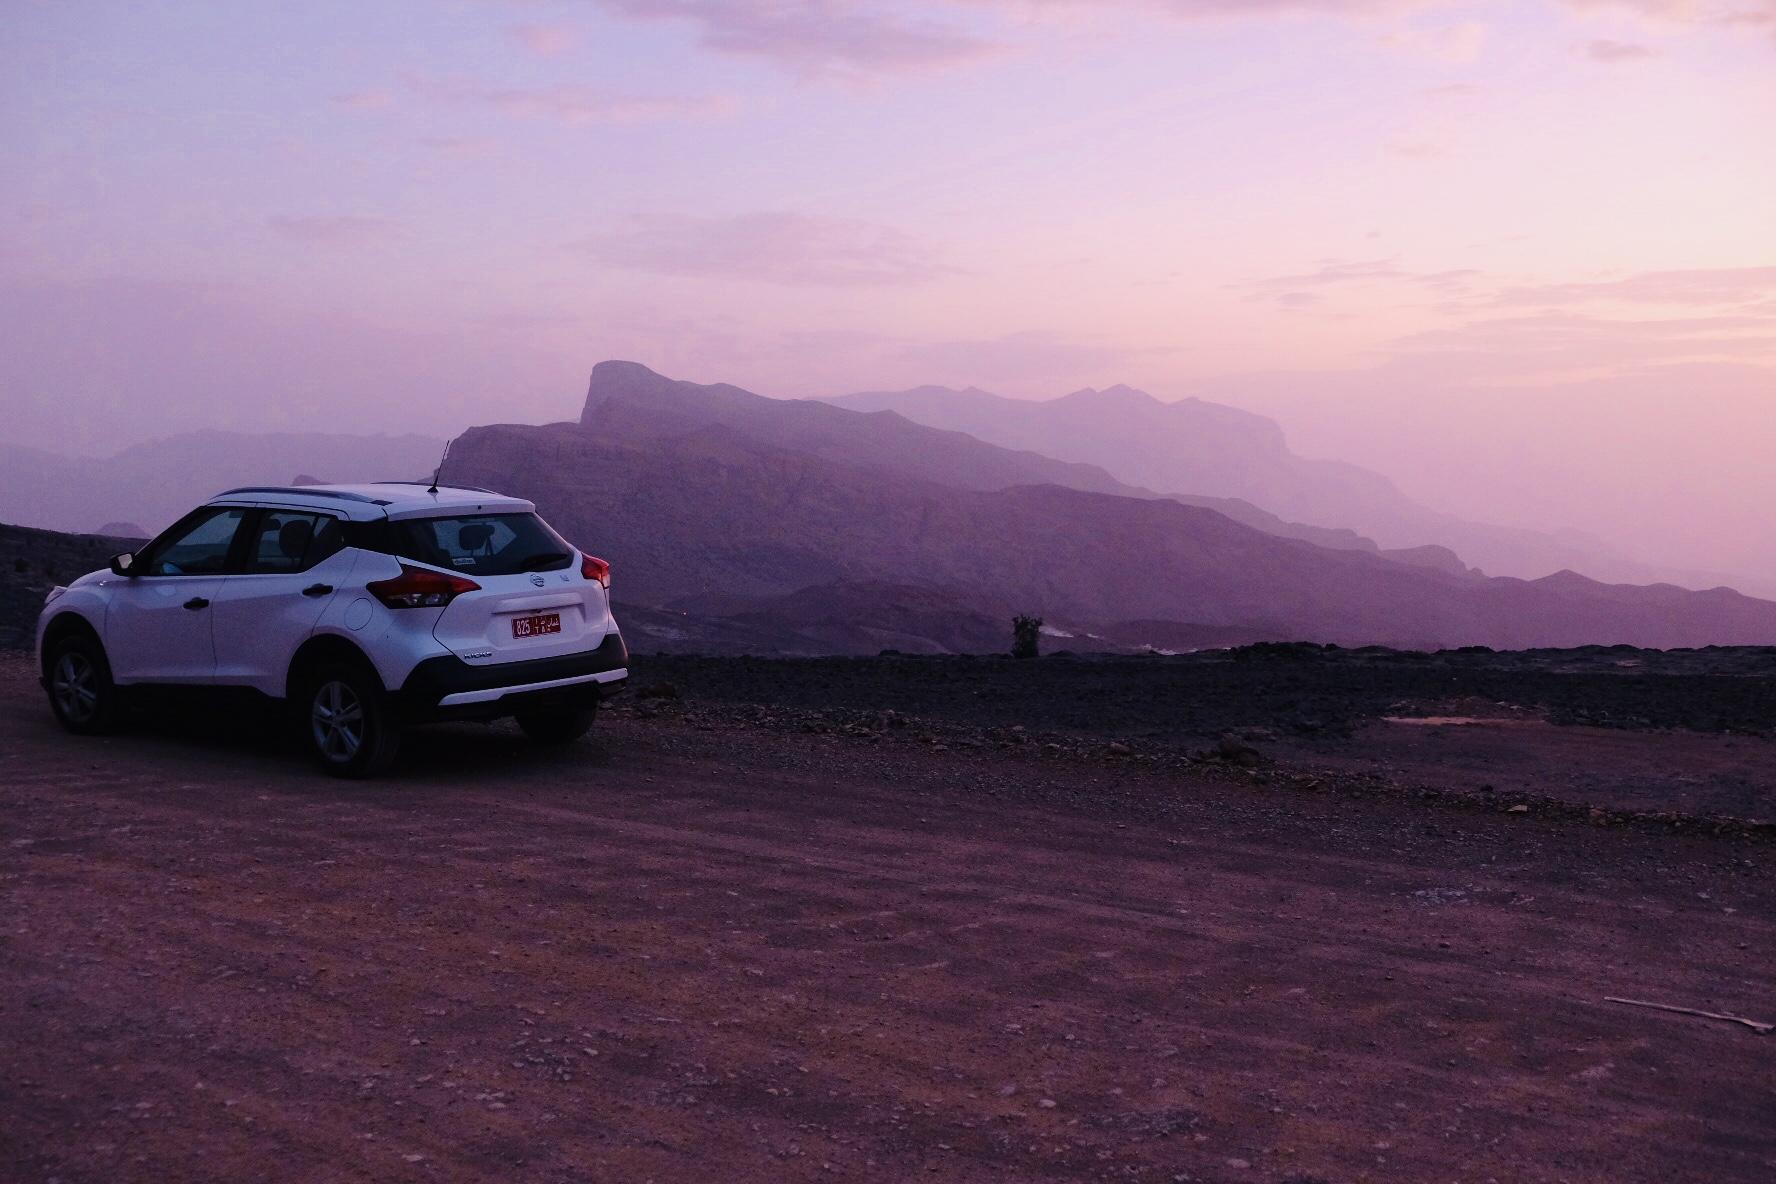 My lil' Nissan, trekking up Jebel Shams